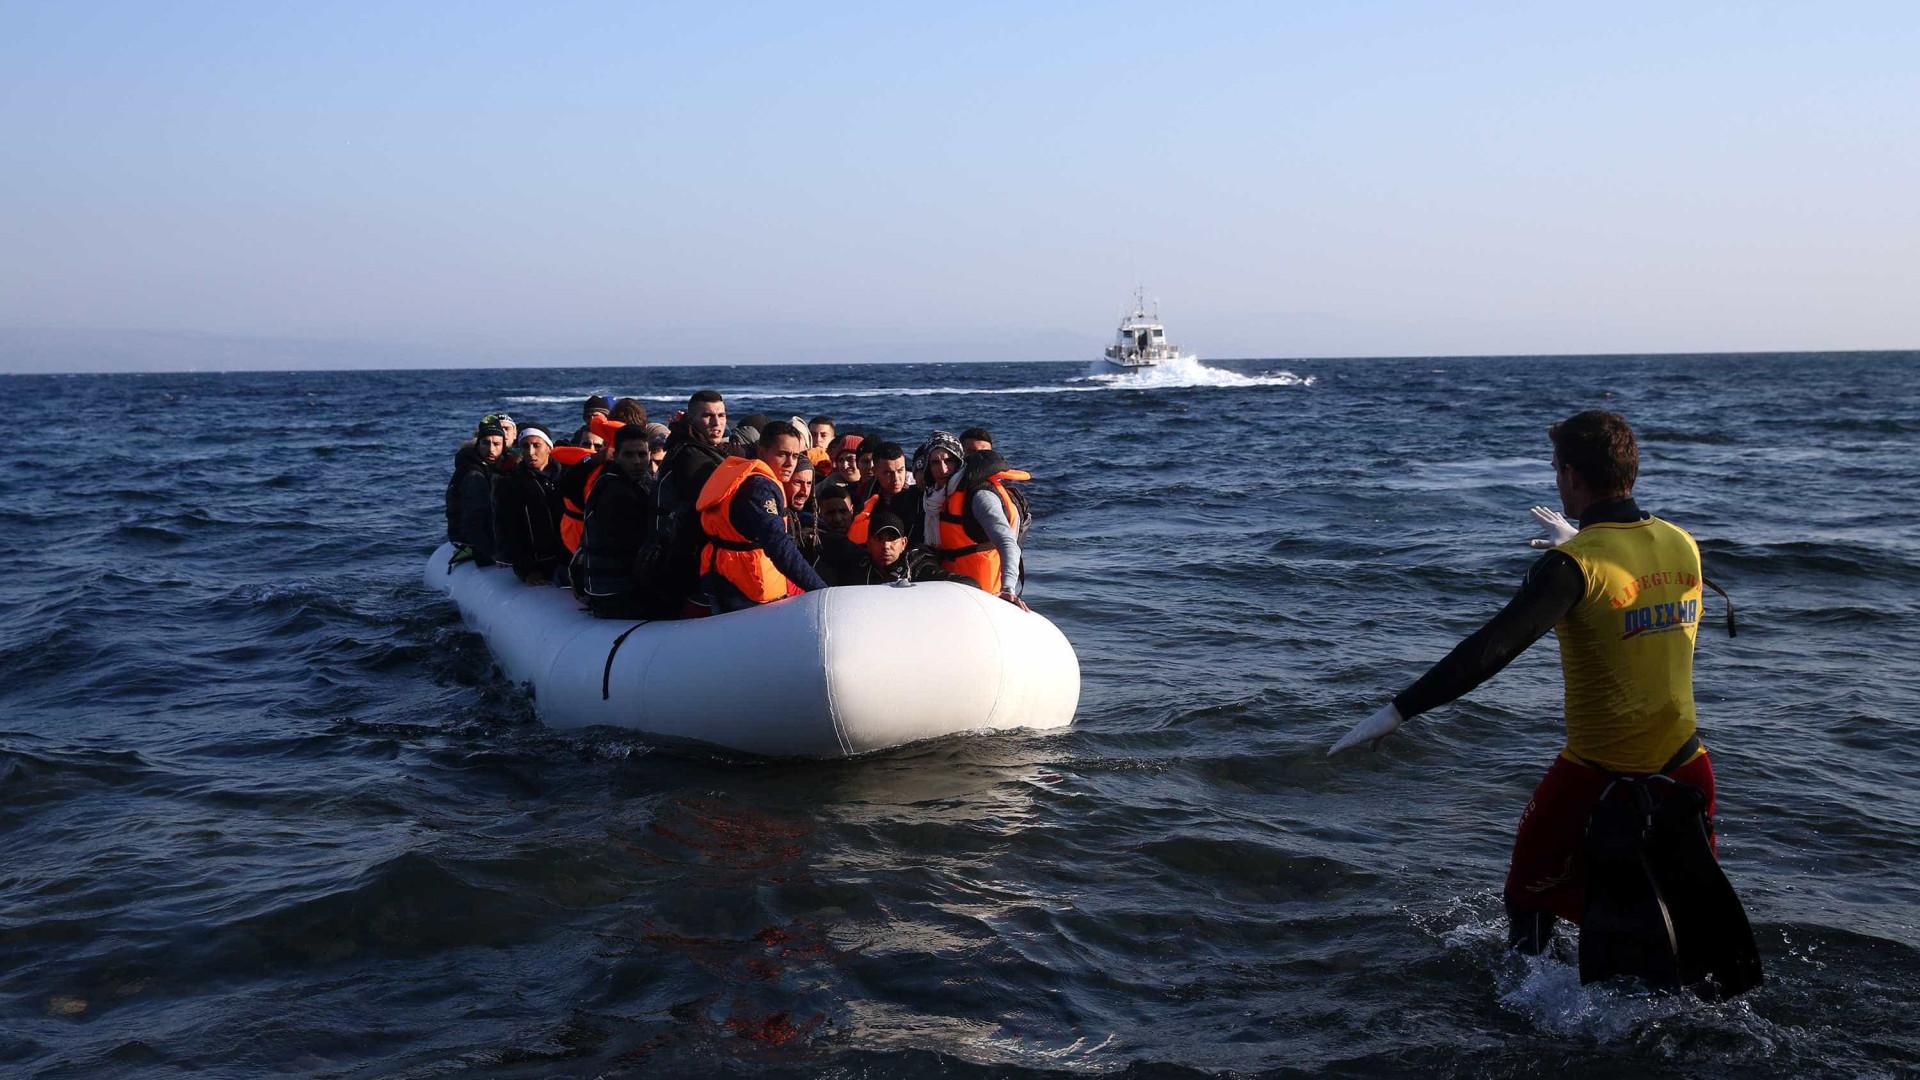 Estados-membros podem bloquear venda de botes insufláveis para a Líbia